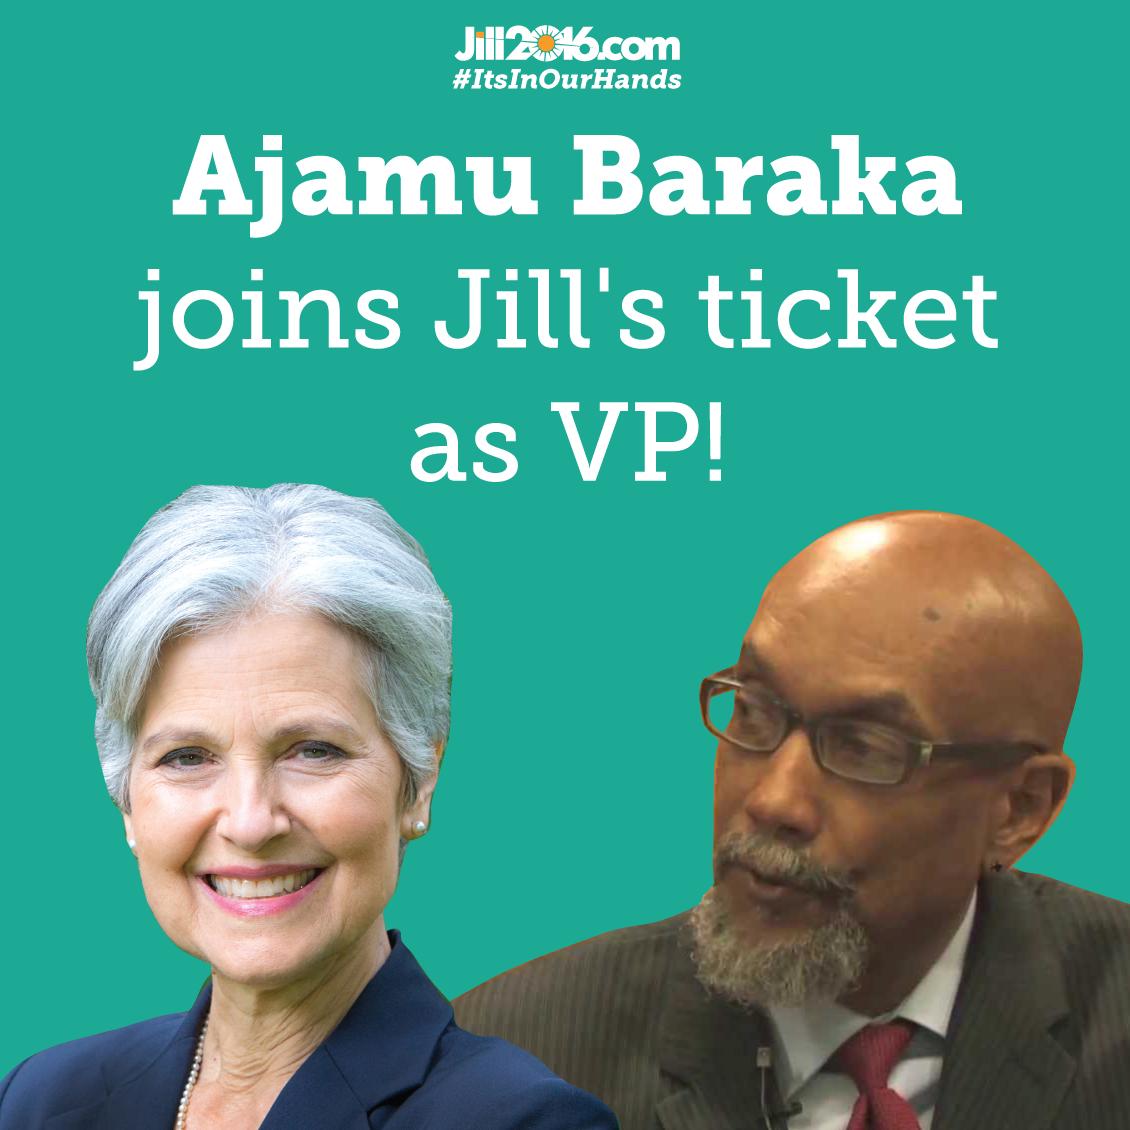 Jill Stein Selects Human Rights Activist Ajamu Baraka as Vice-Presidential Running Mate - Jill Stein 2016